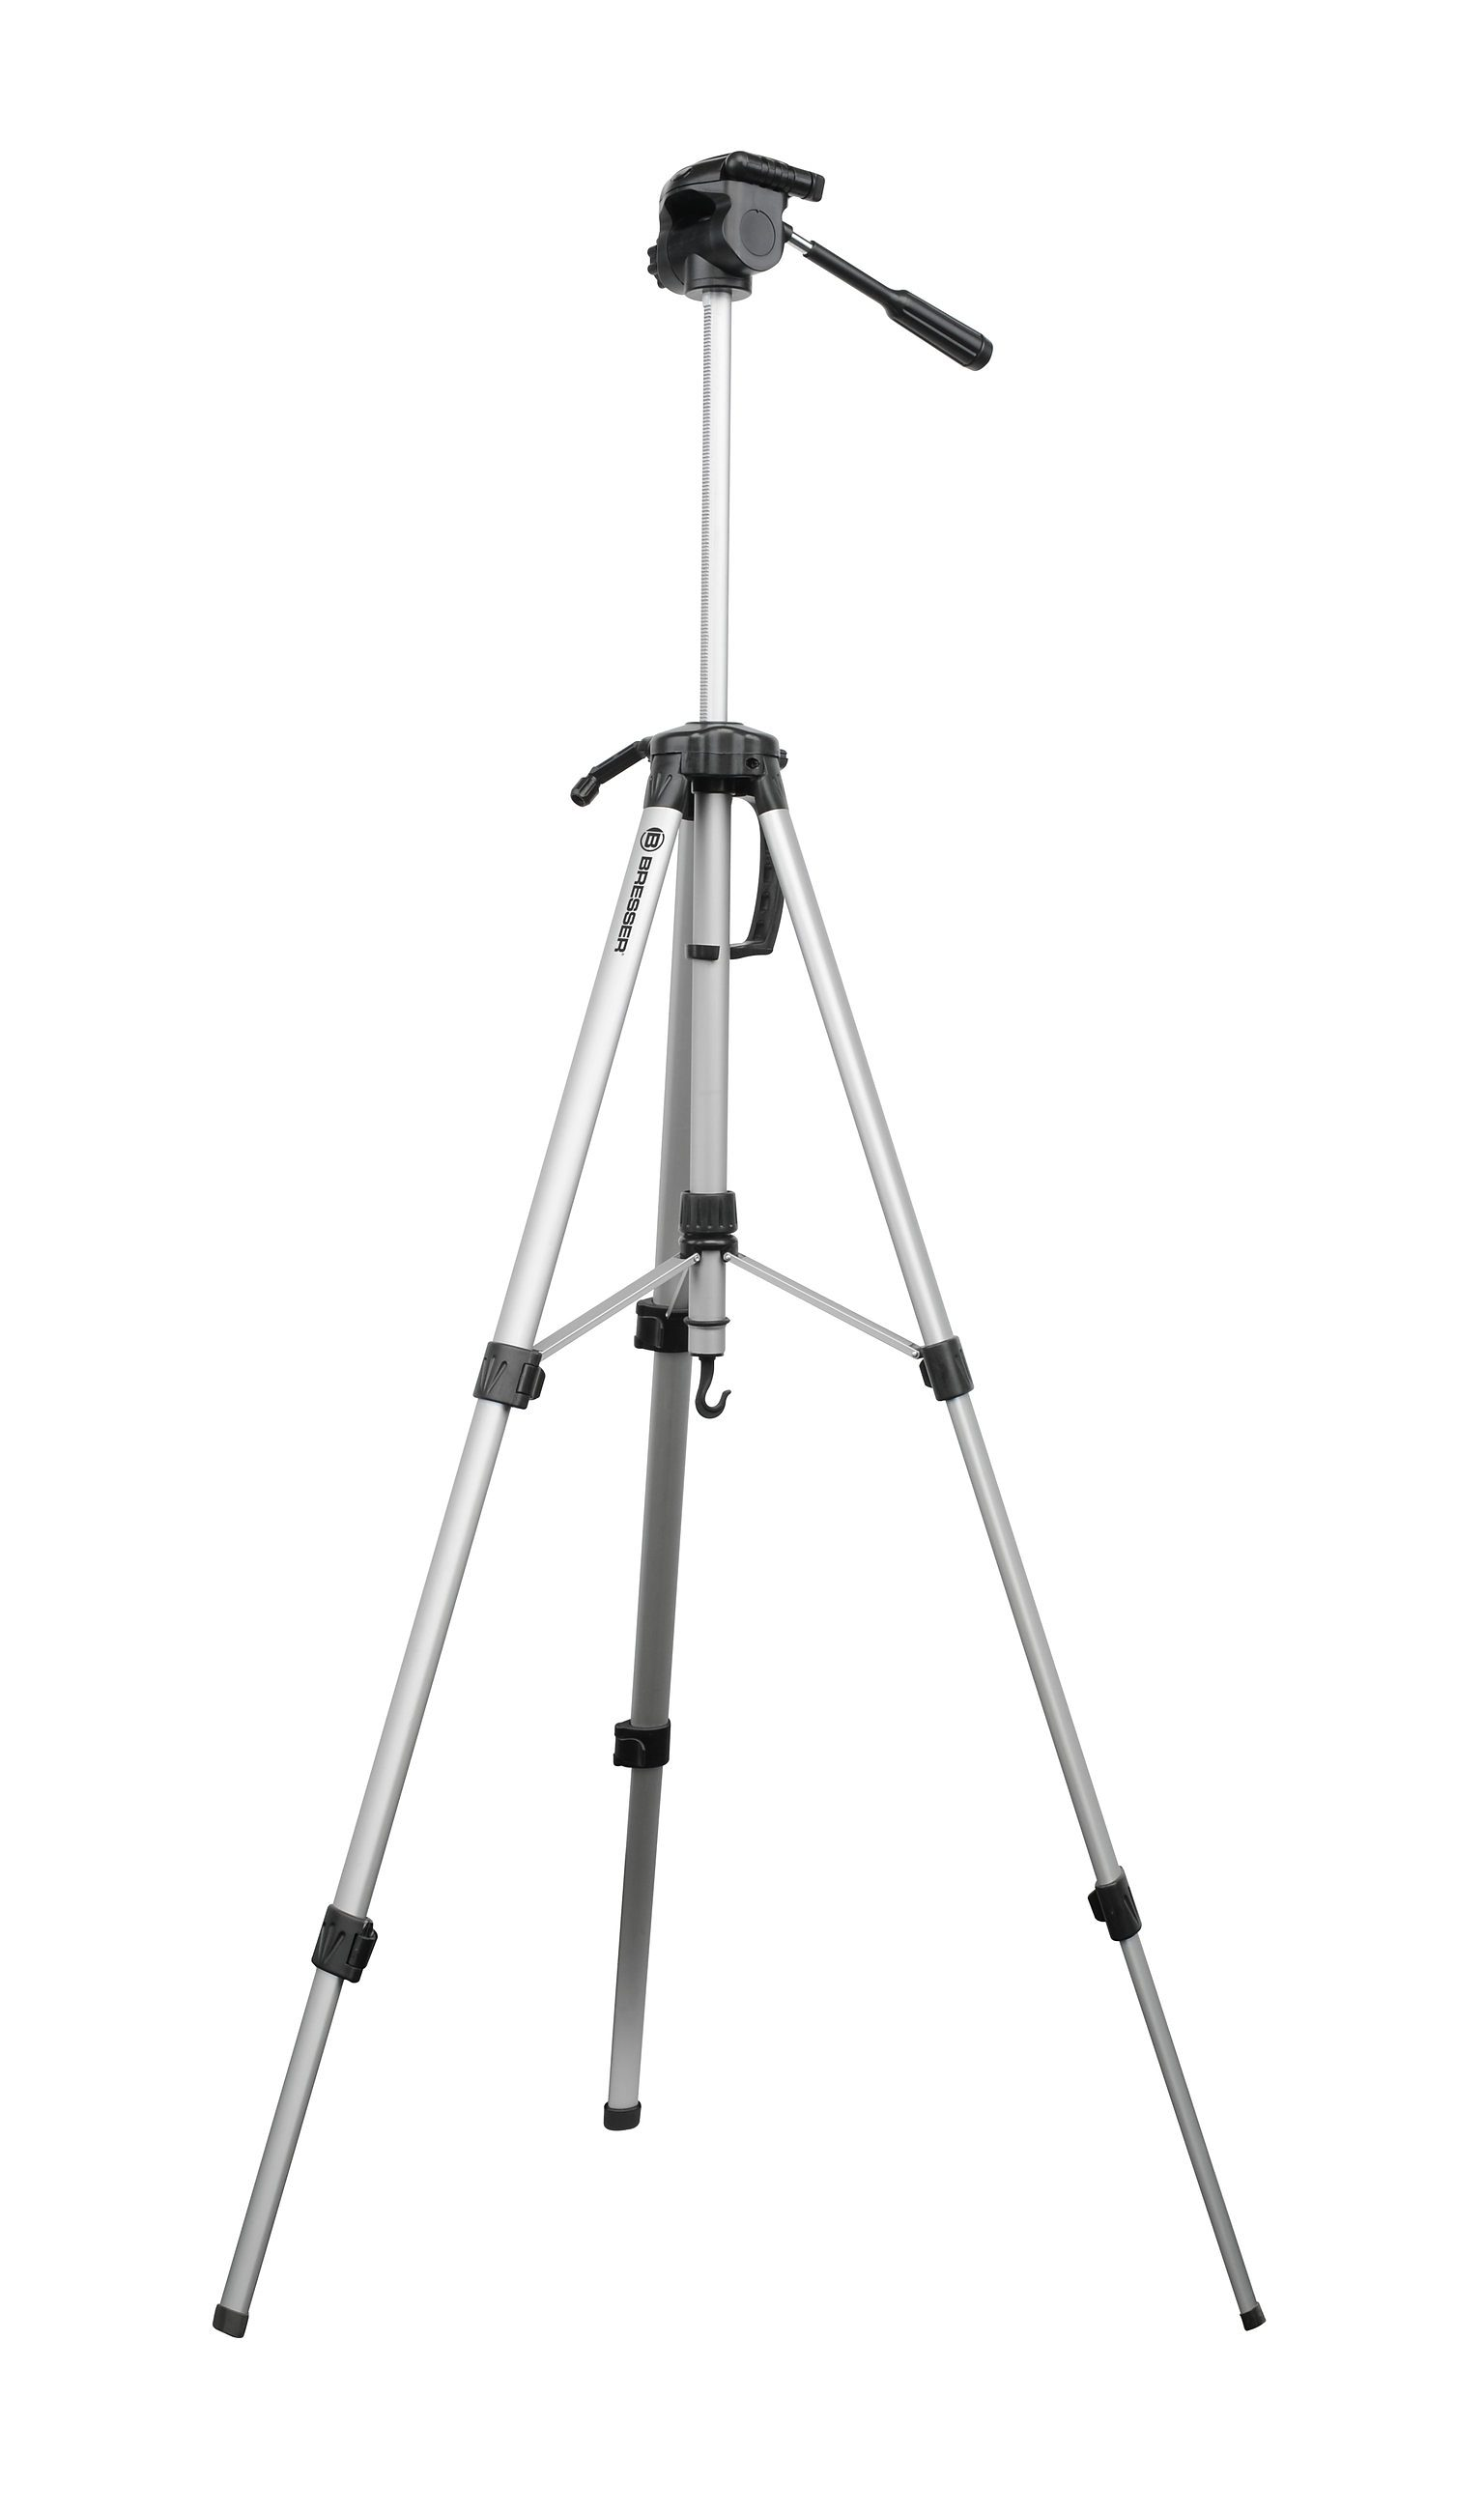 BRESSER Fotostativ »BRESSER Dreibeinstativ 2,5 KG 159 cm«